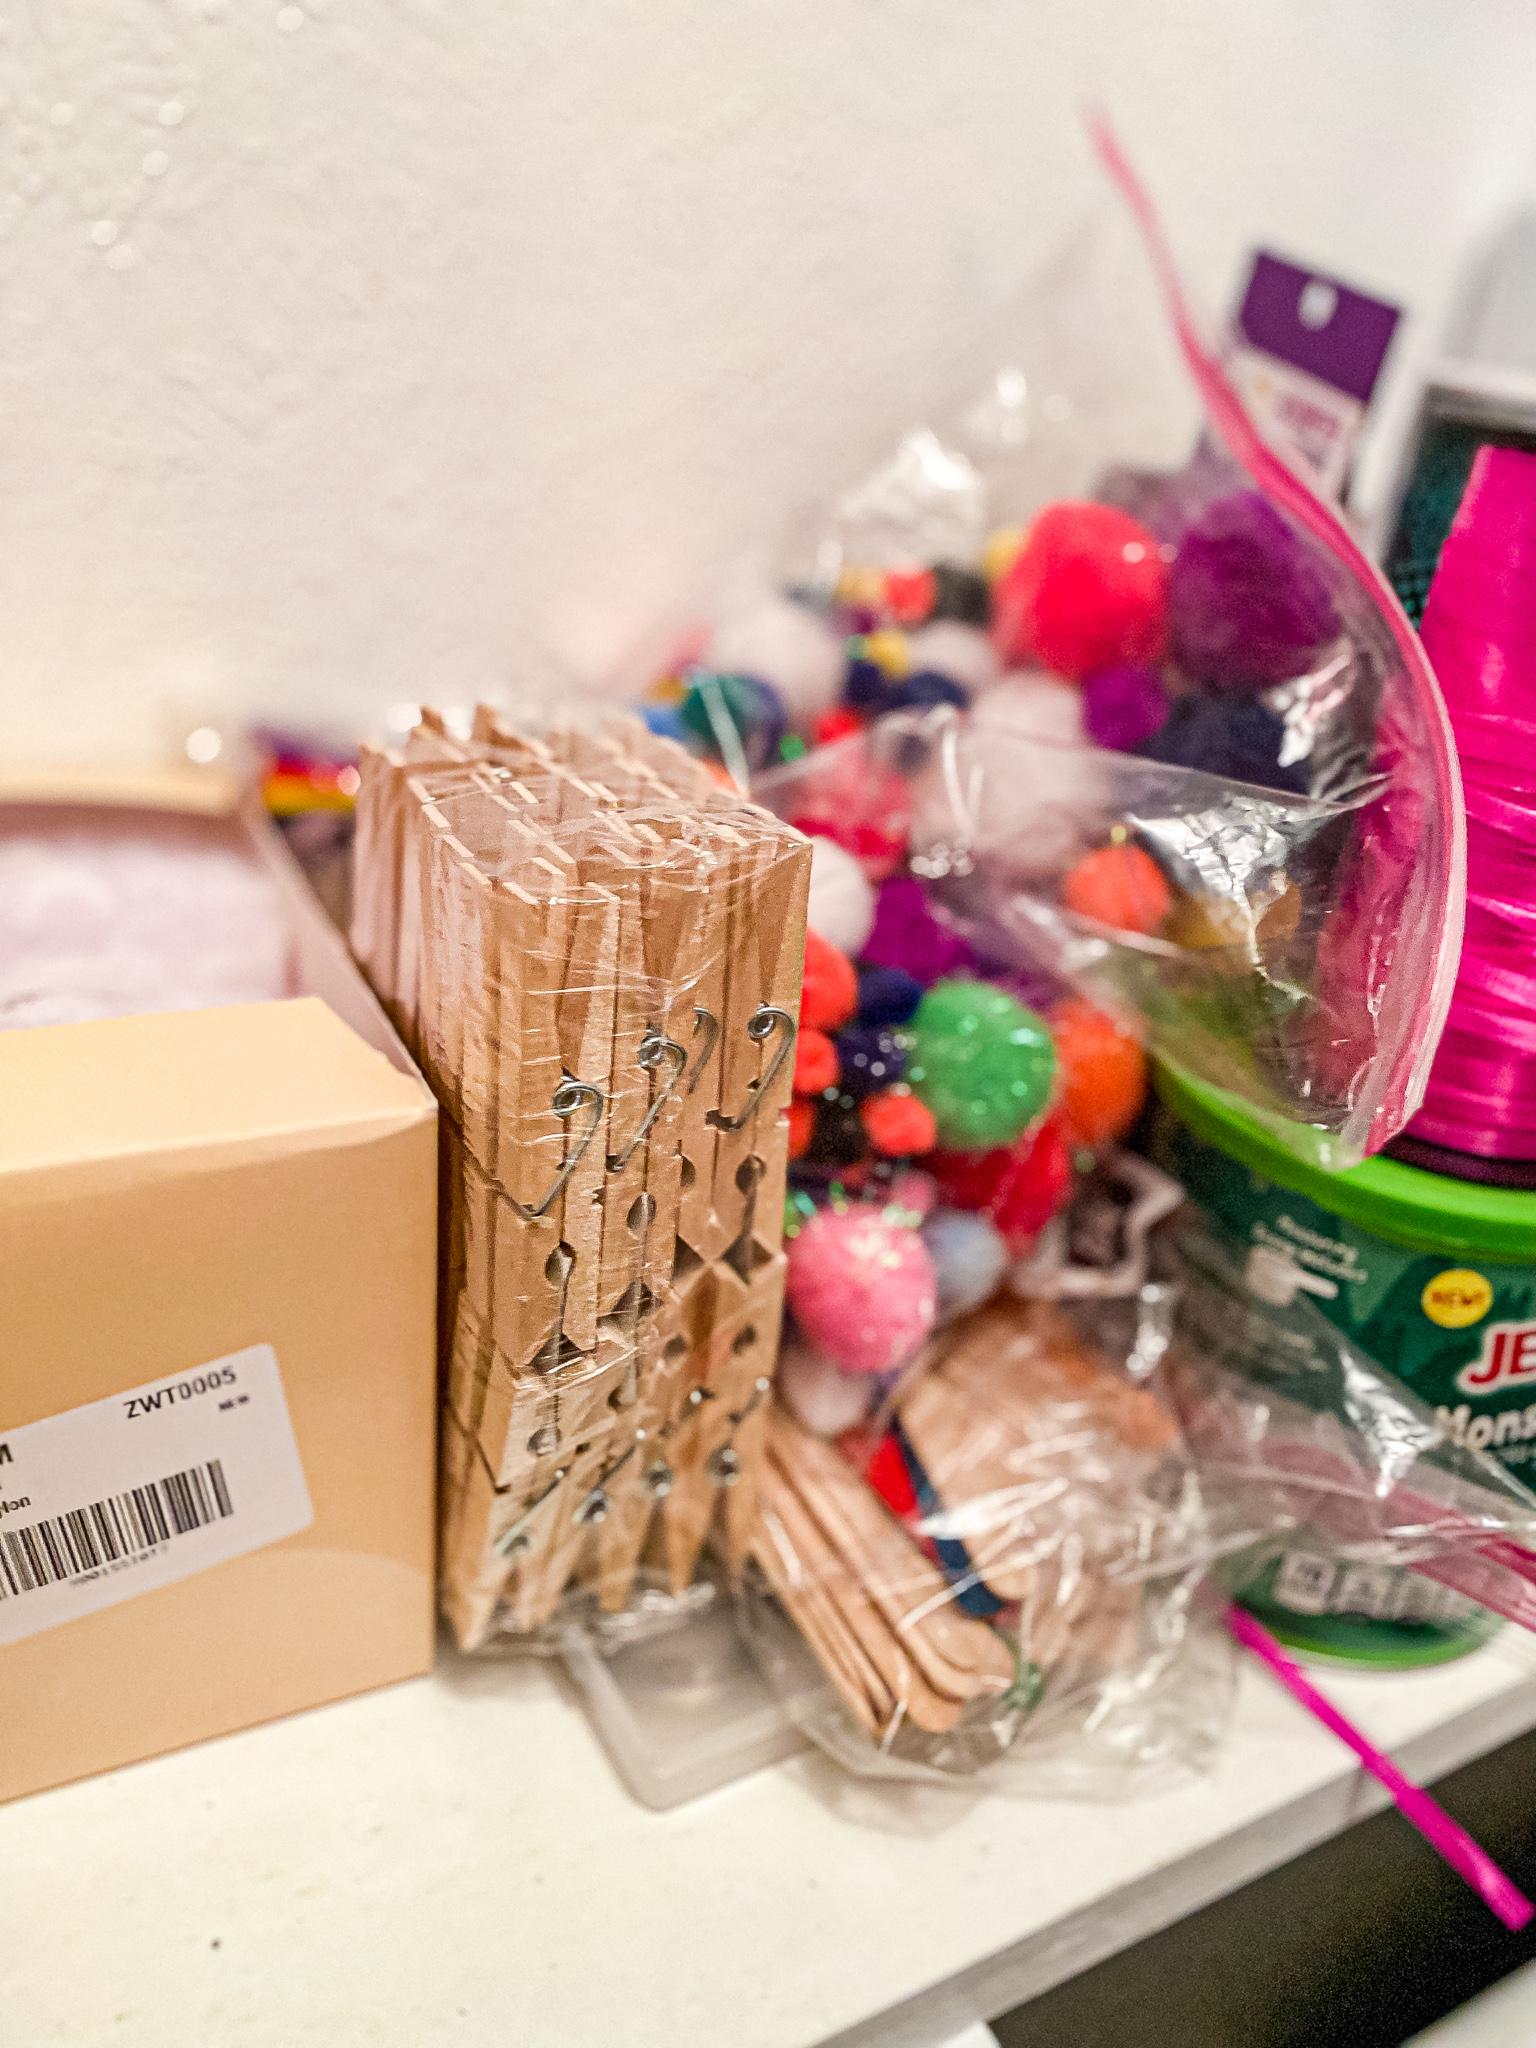 Homeschool Closet Materials - Clothespins and Pom-pom balls and craft supplies